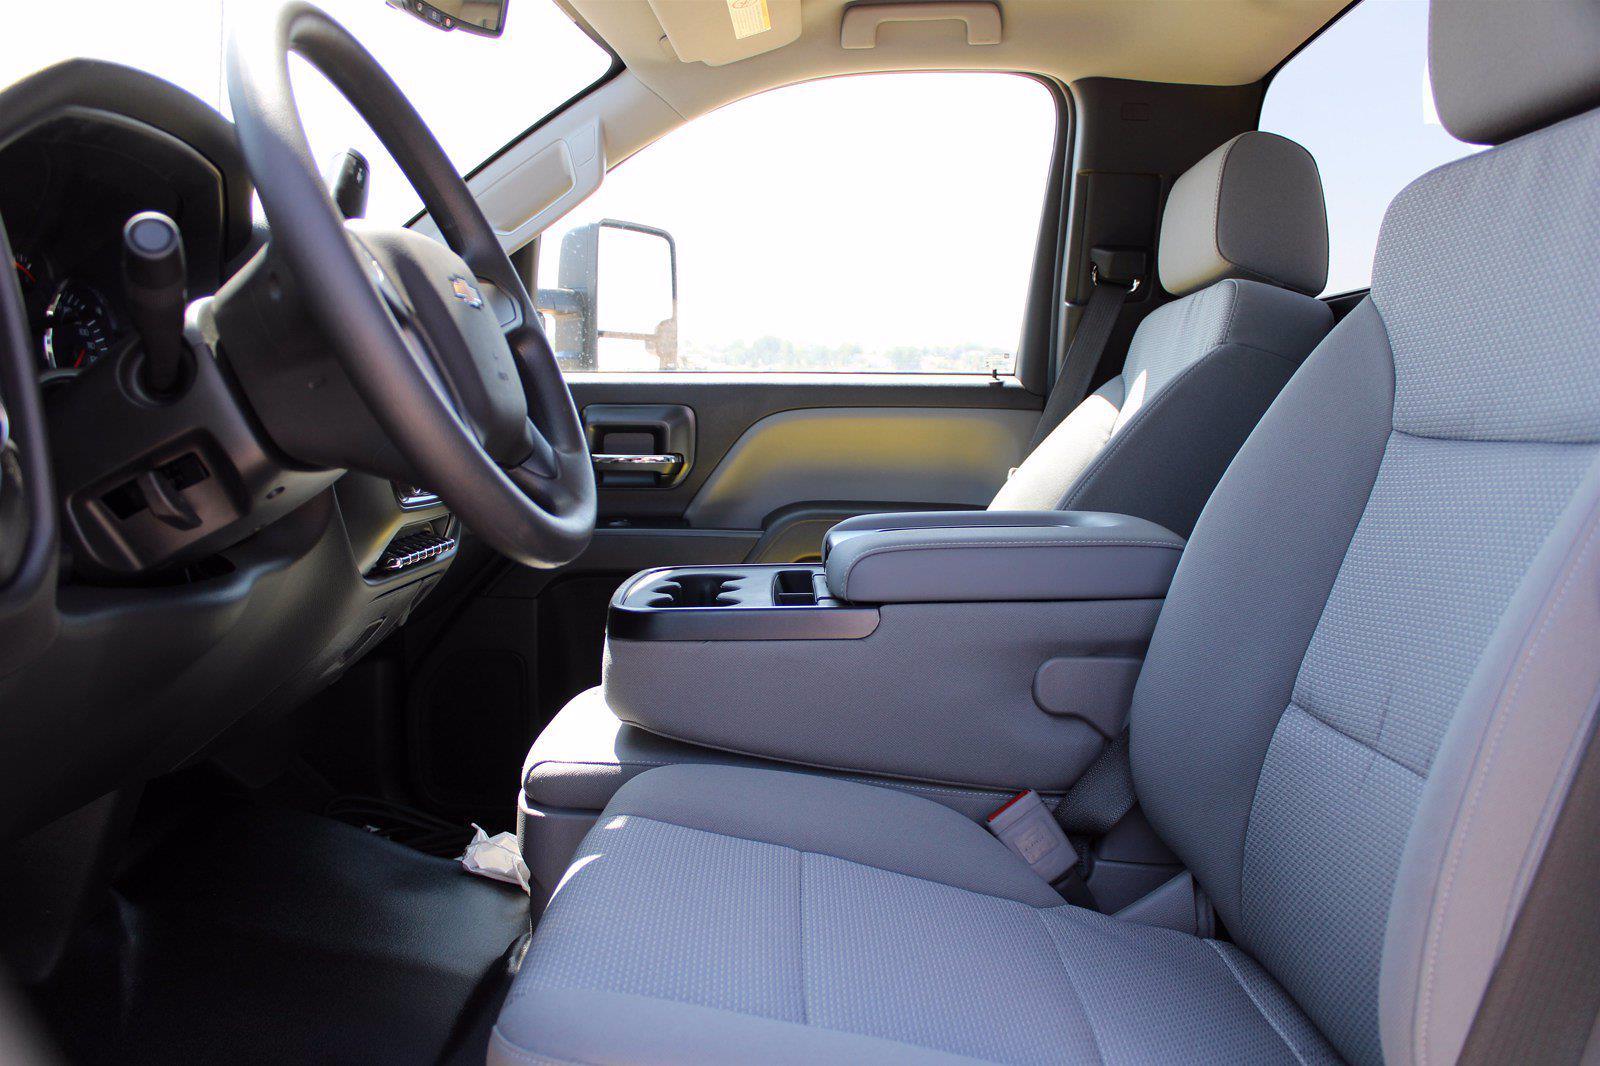 2020 Chevrolet Silverado 5500 DRW 4x2, Cab Chassis #D100457 - photo 7